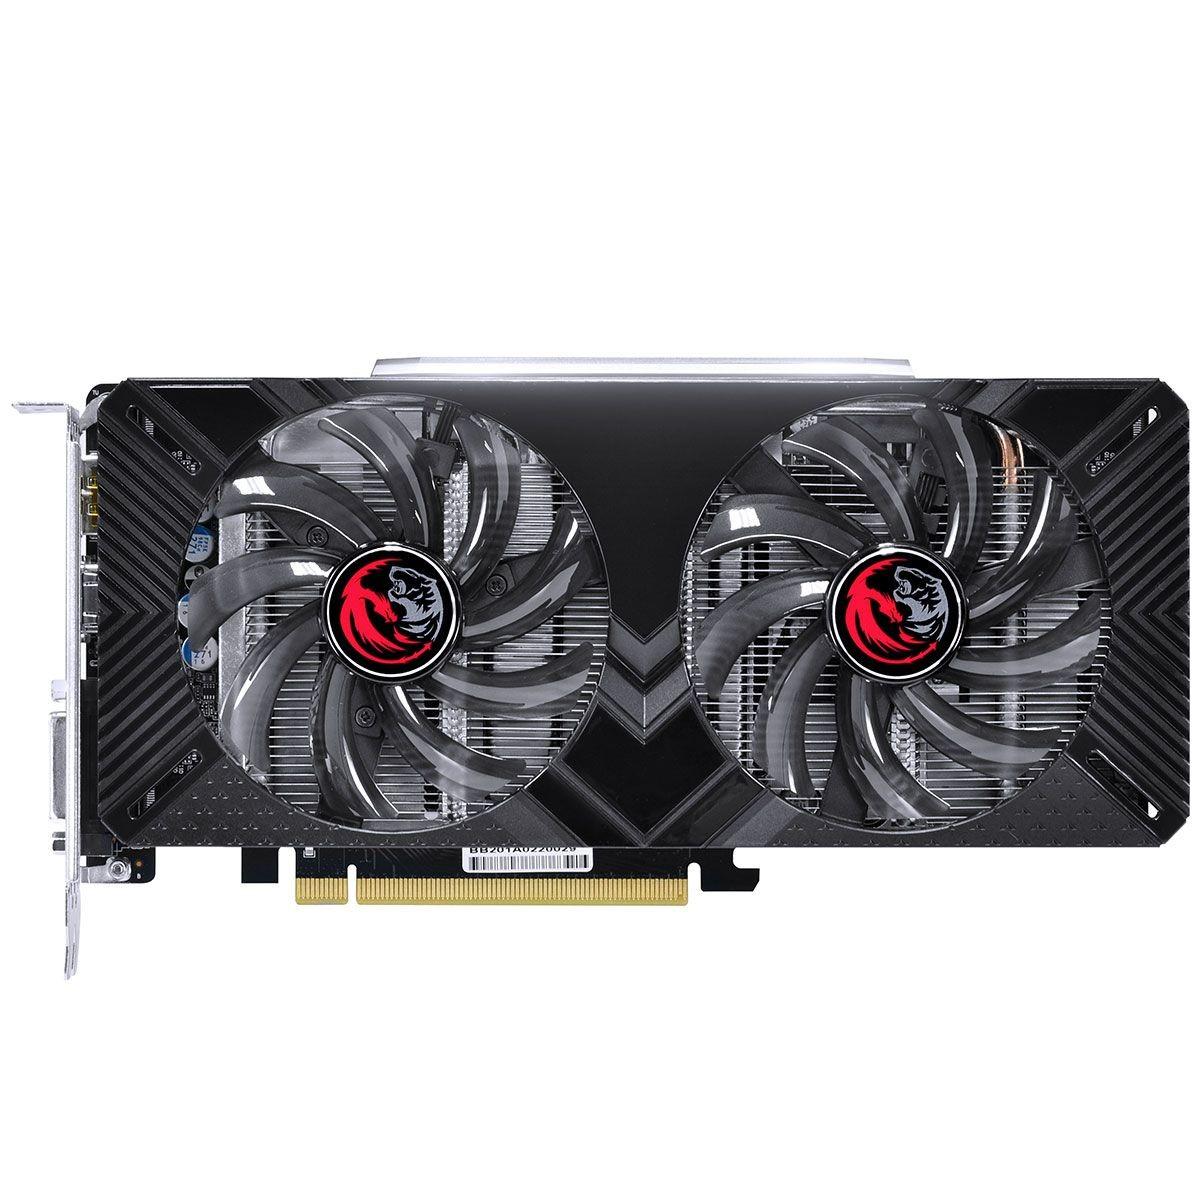 Placa de Vídeo PCyes GeForce GTX 1660 Super OC Dual Fan, 6GB GDDR6, 192Bit, PPSOC16601926G6